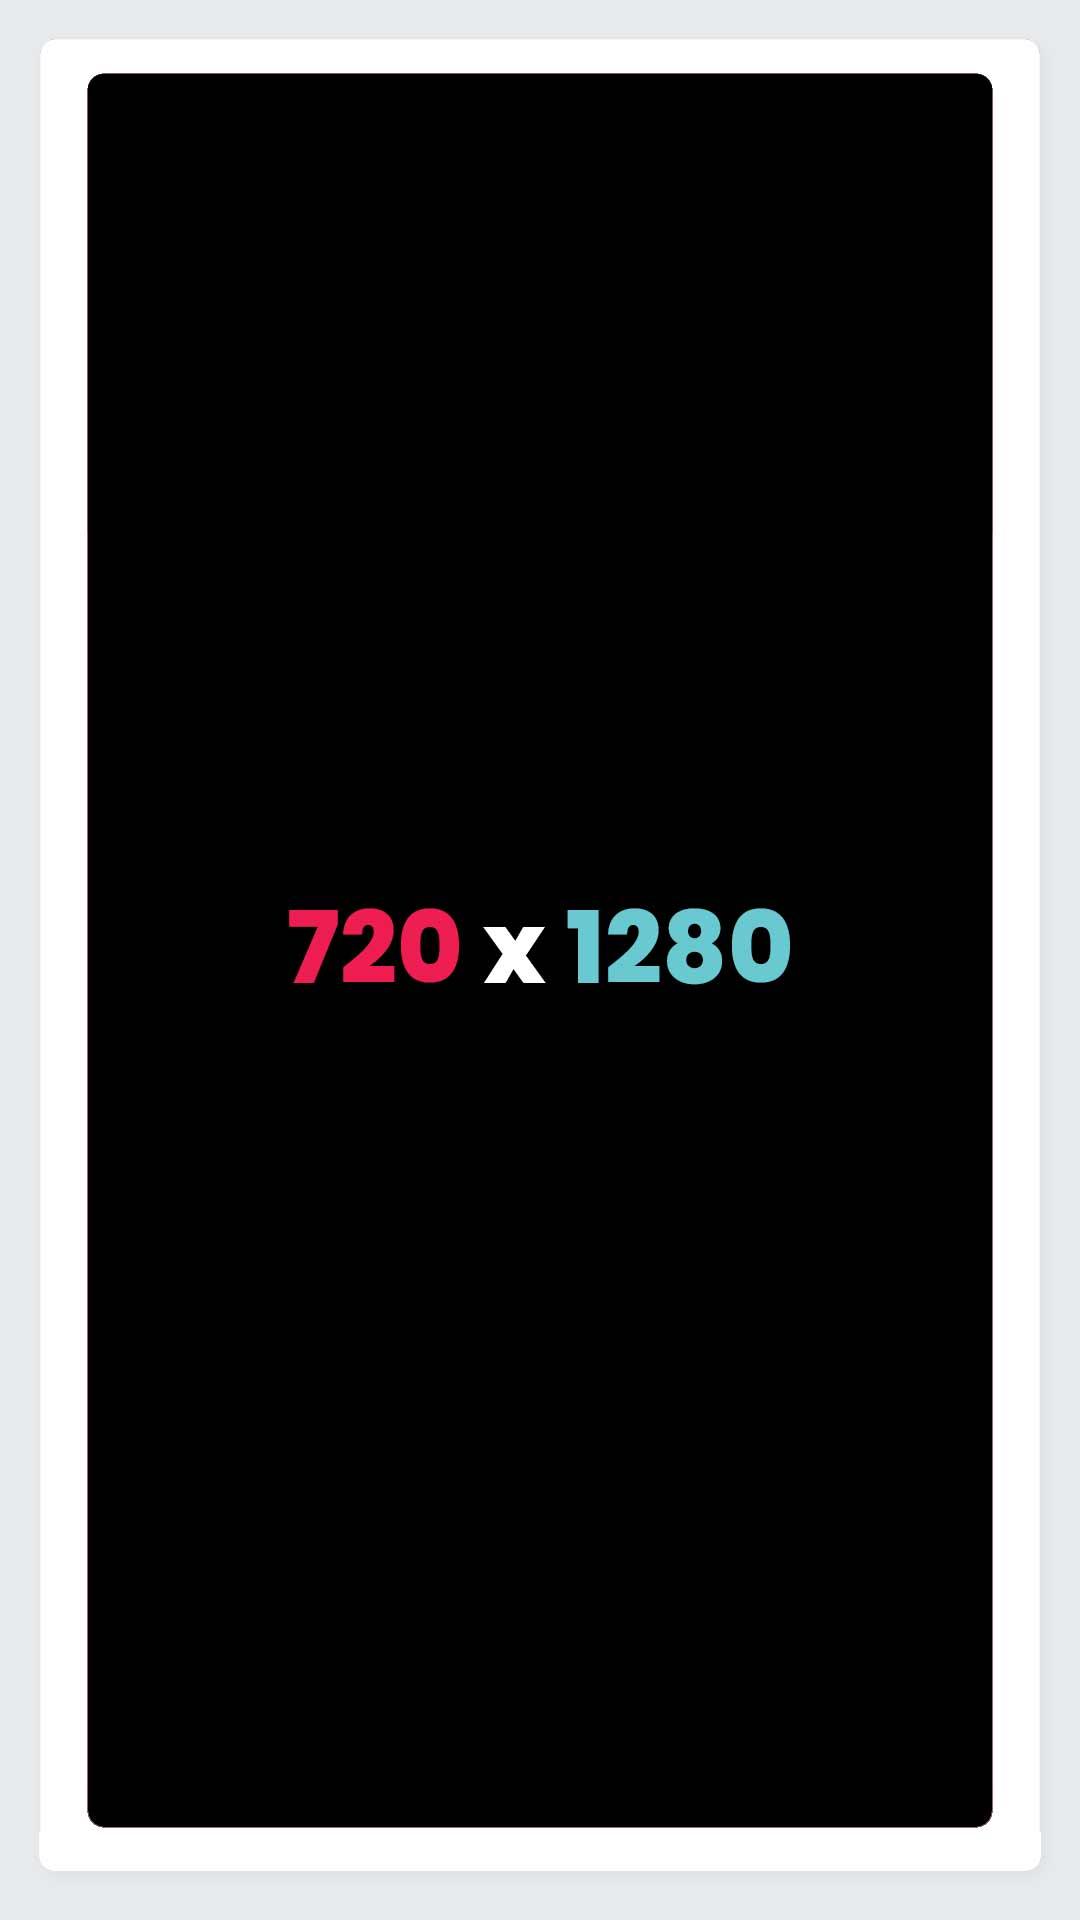 TikTok Video Ad Size / Dimensions